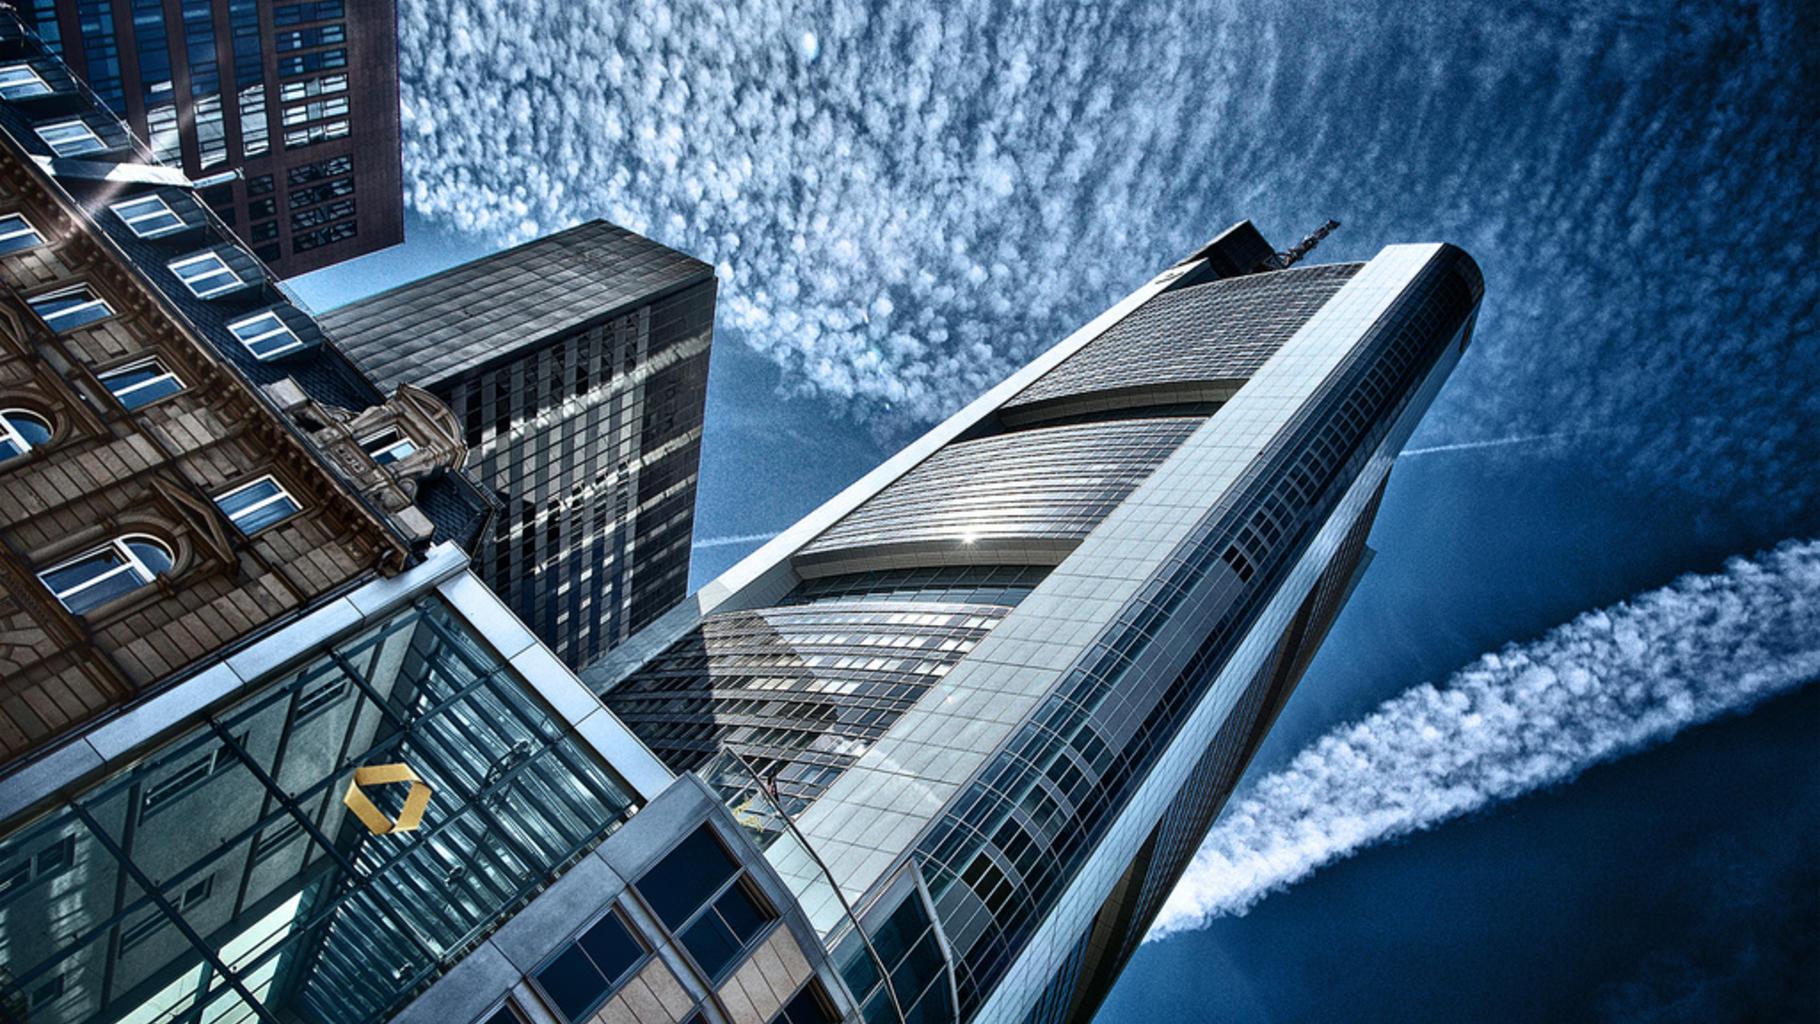 Commerzbank Konzernzentrale Frankfurt am Main